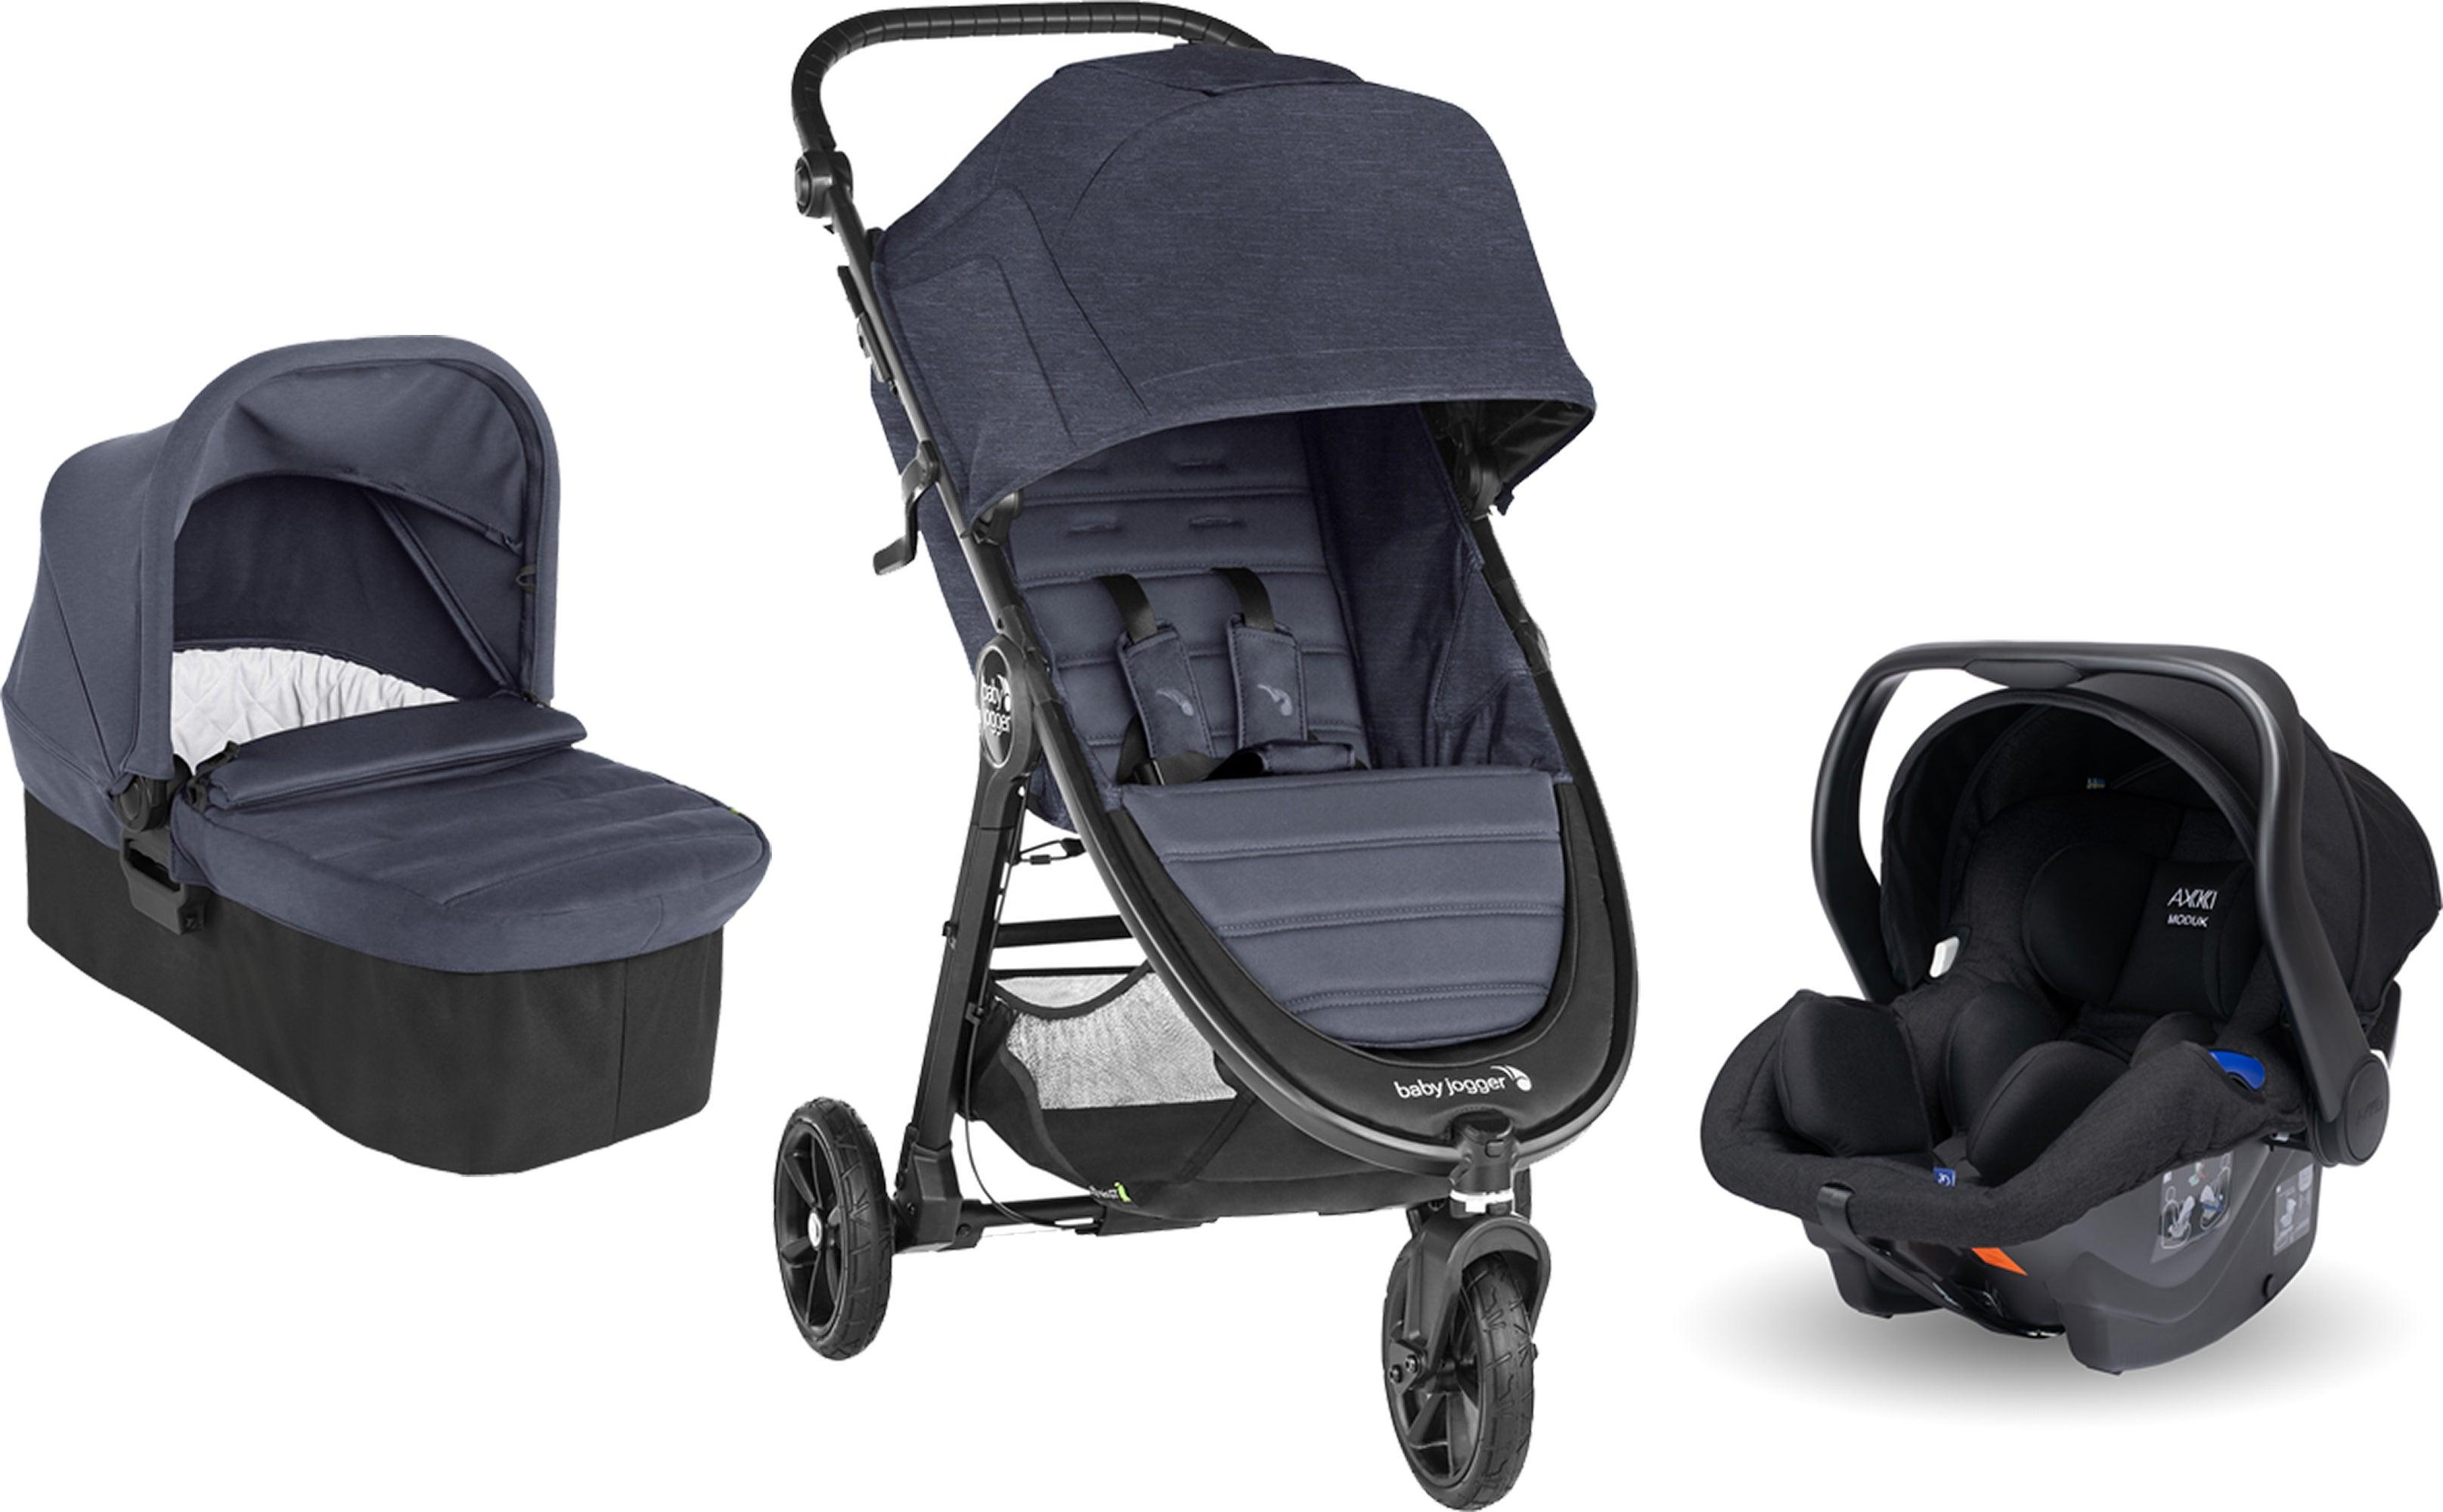 Baby Jogger City Mini GT 2 Sittvagn inkl. Babyskydd, Adapter & Liggdel, Carbon